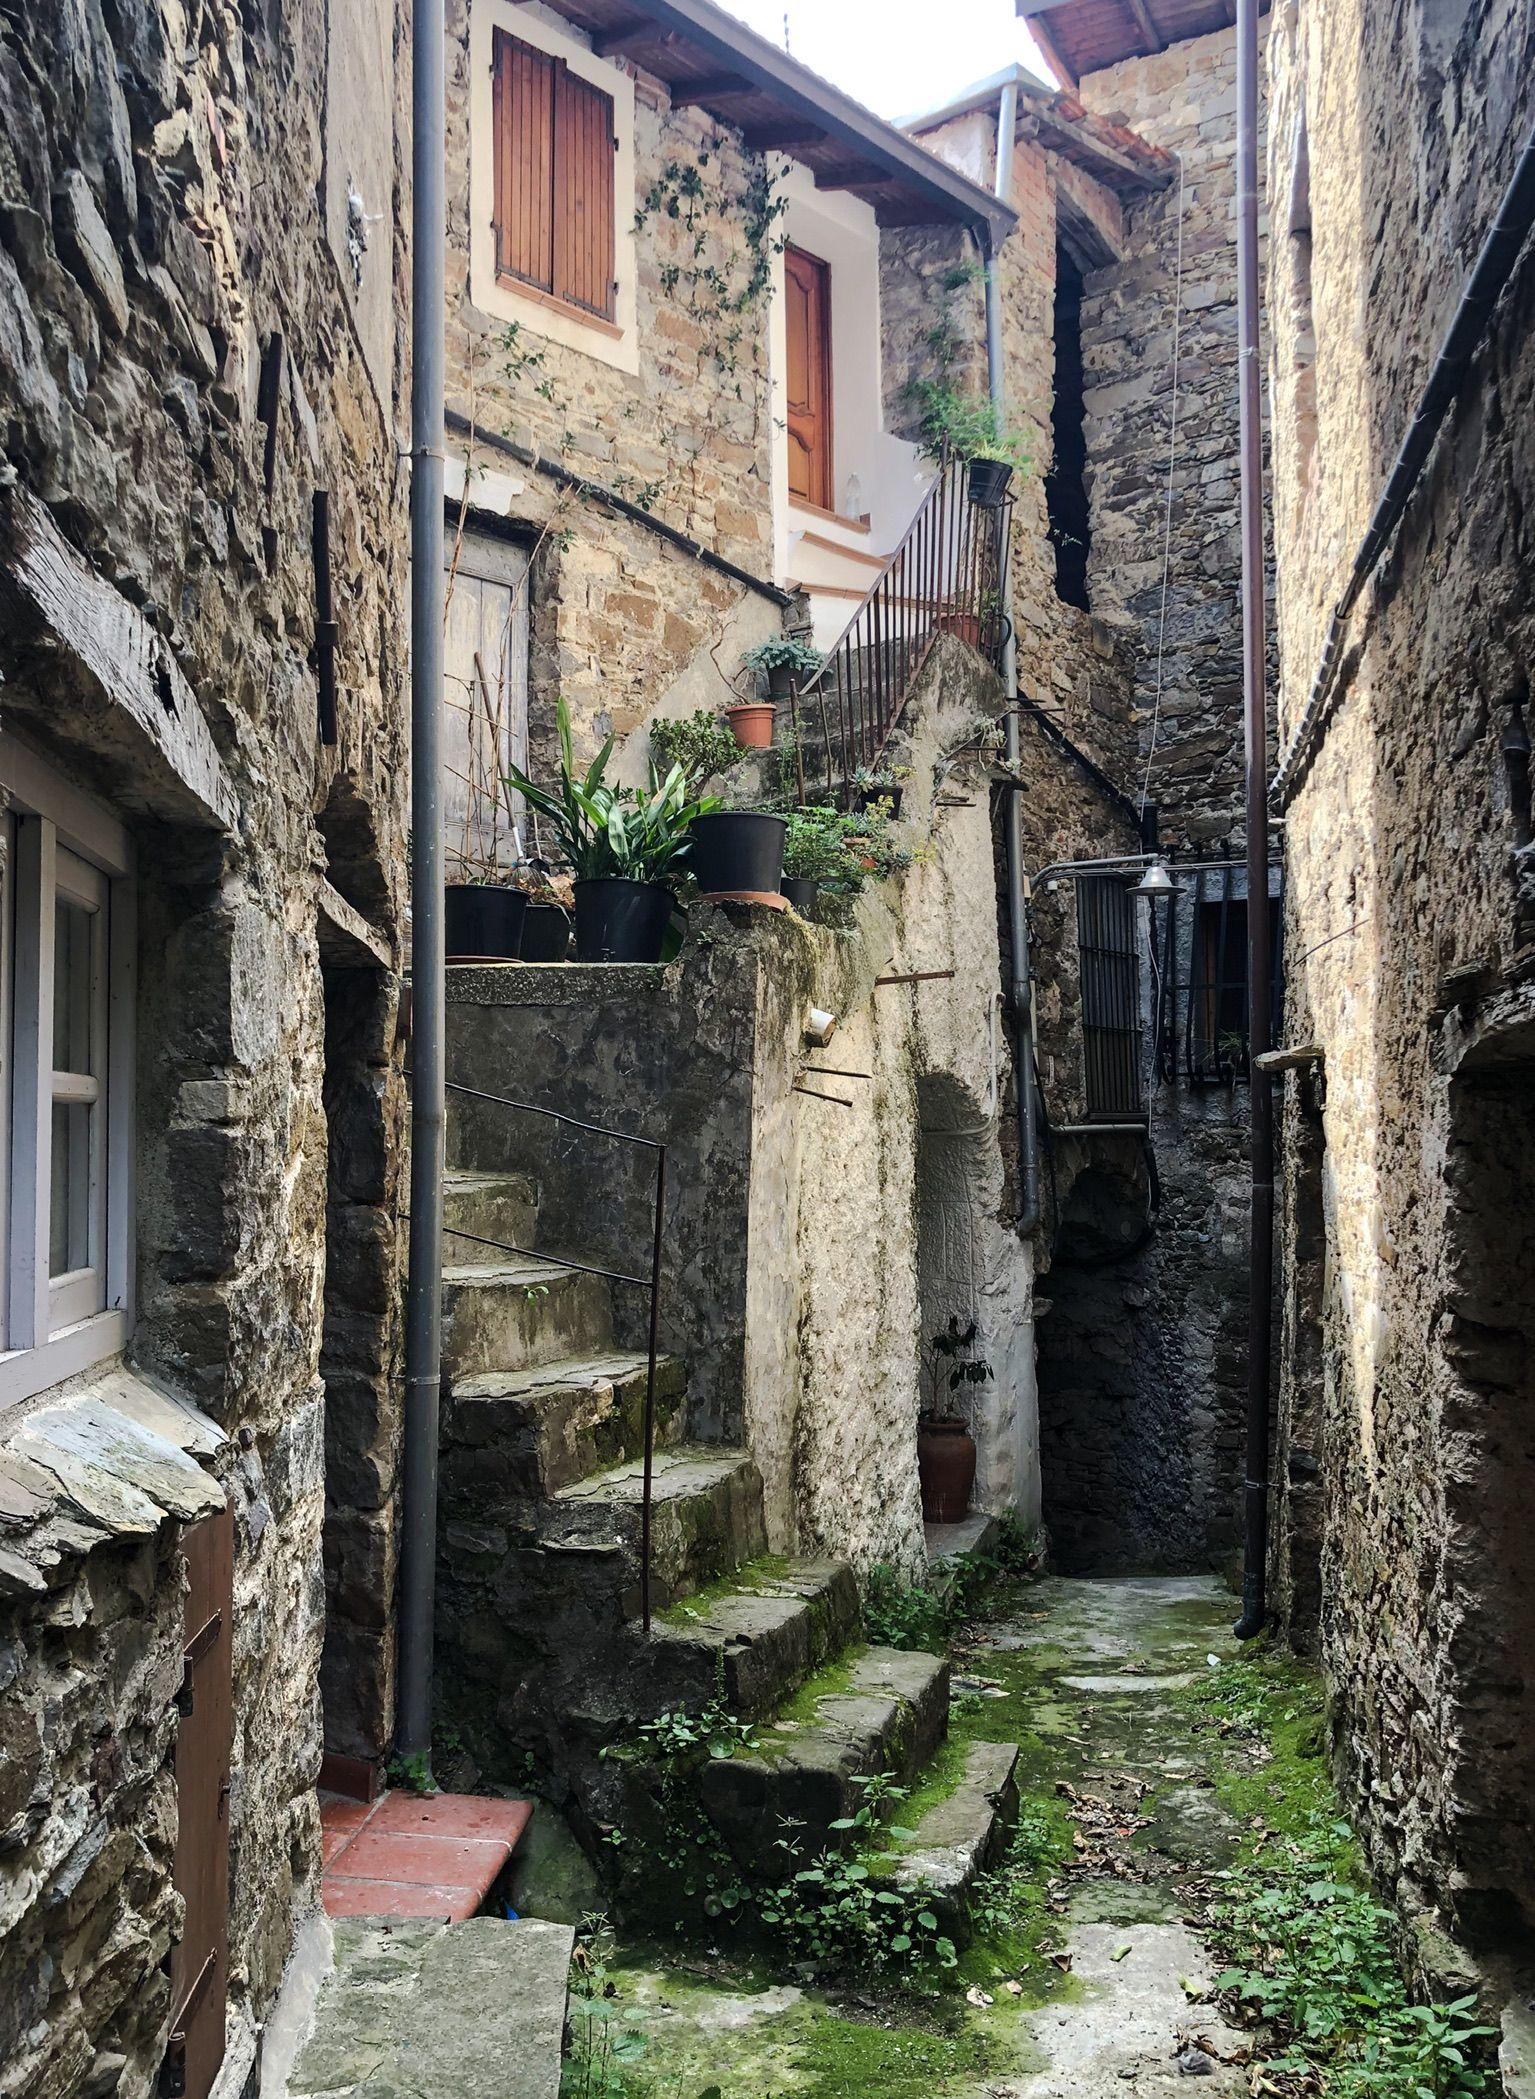 Apricale village